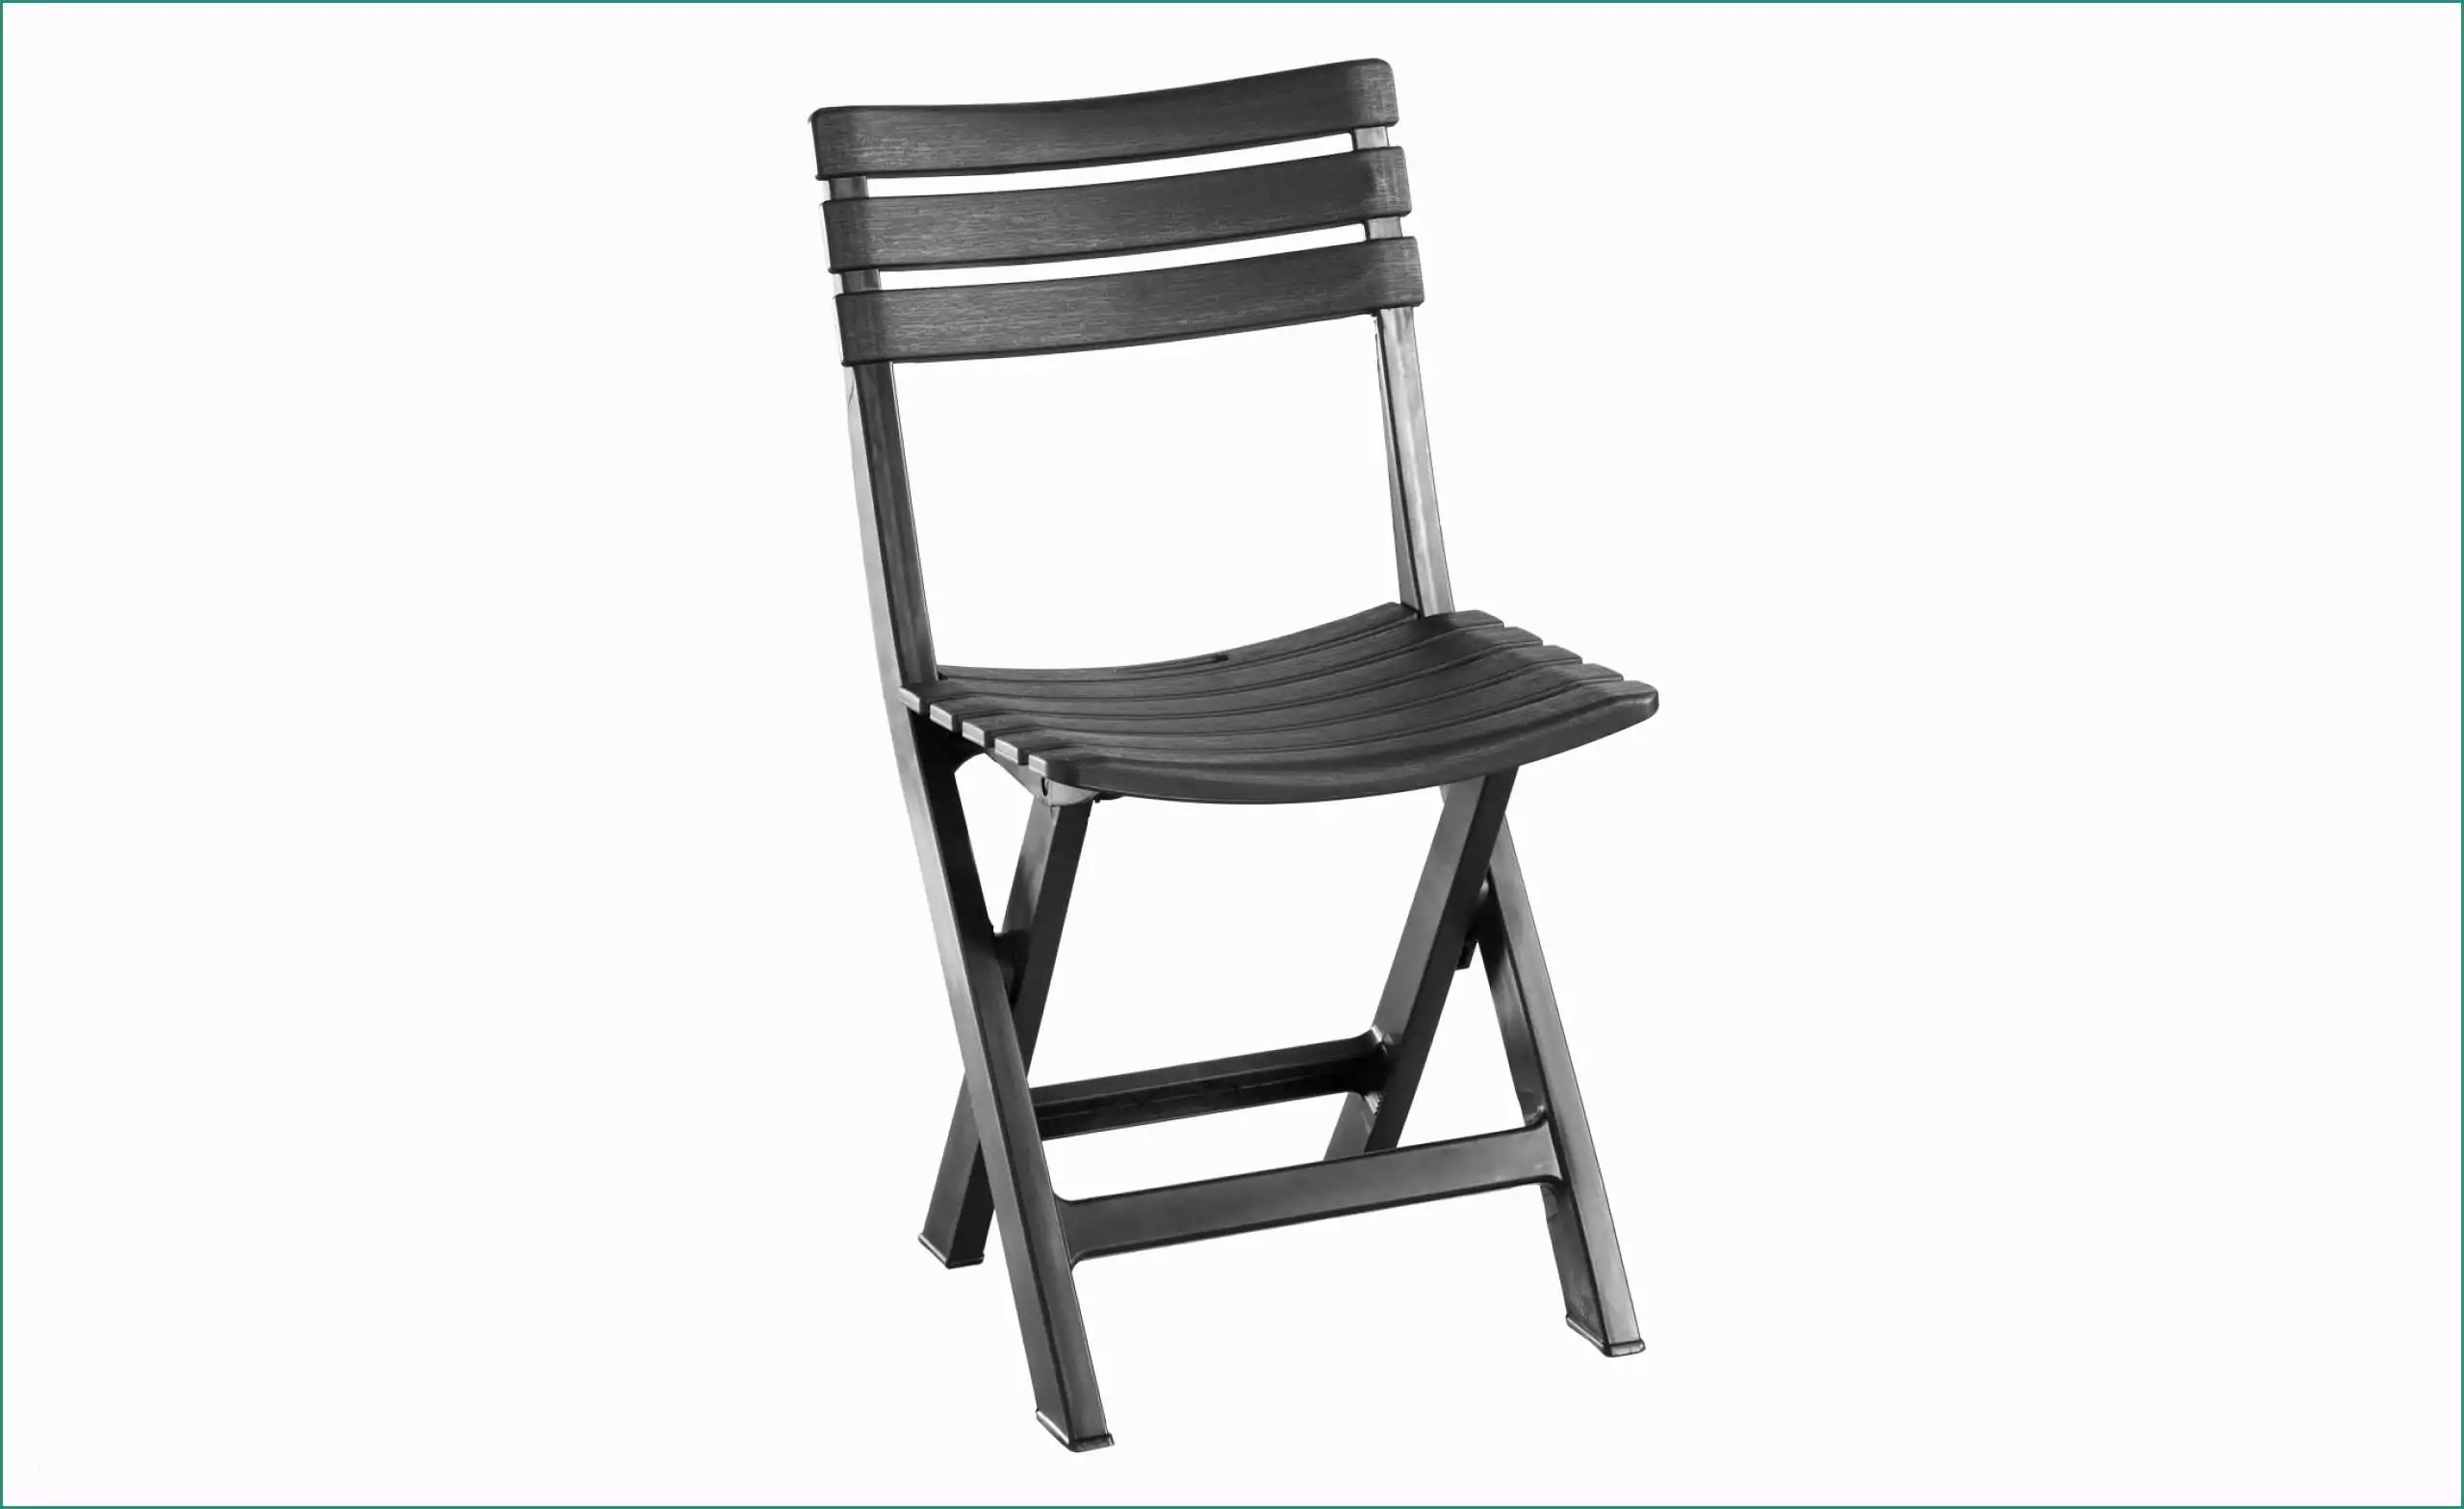 Stock Sedie Di Legno.Stock Sedie Sedie Moderne Vettoriali Stock Bogalo 8556007